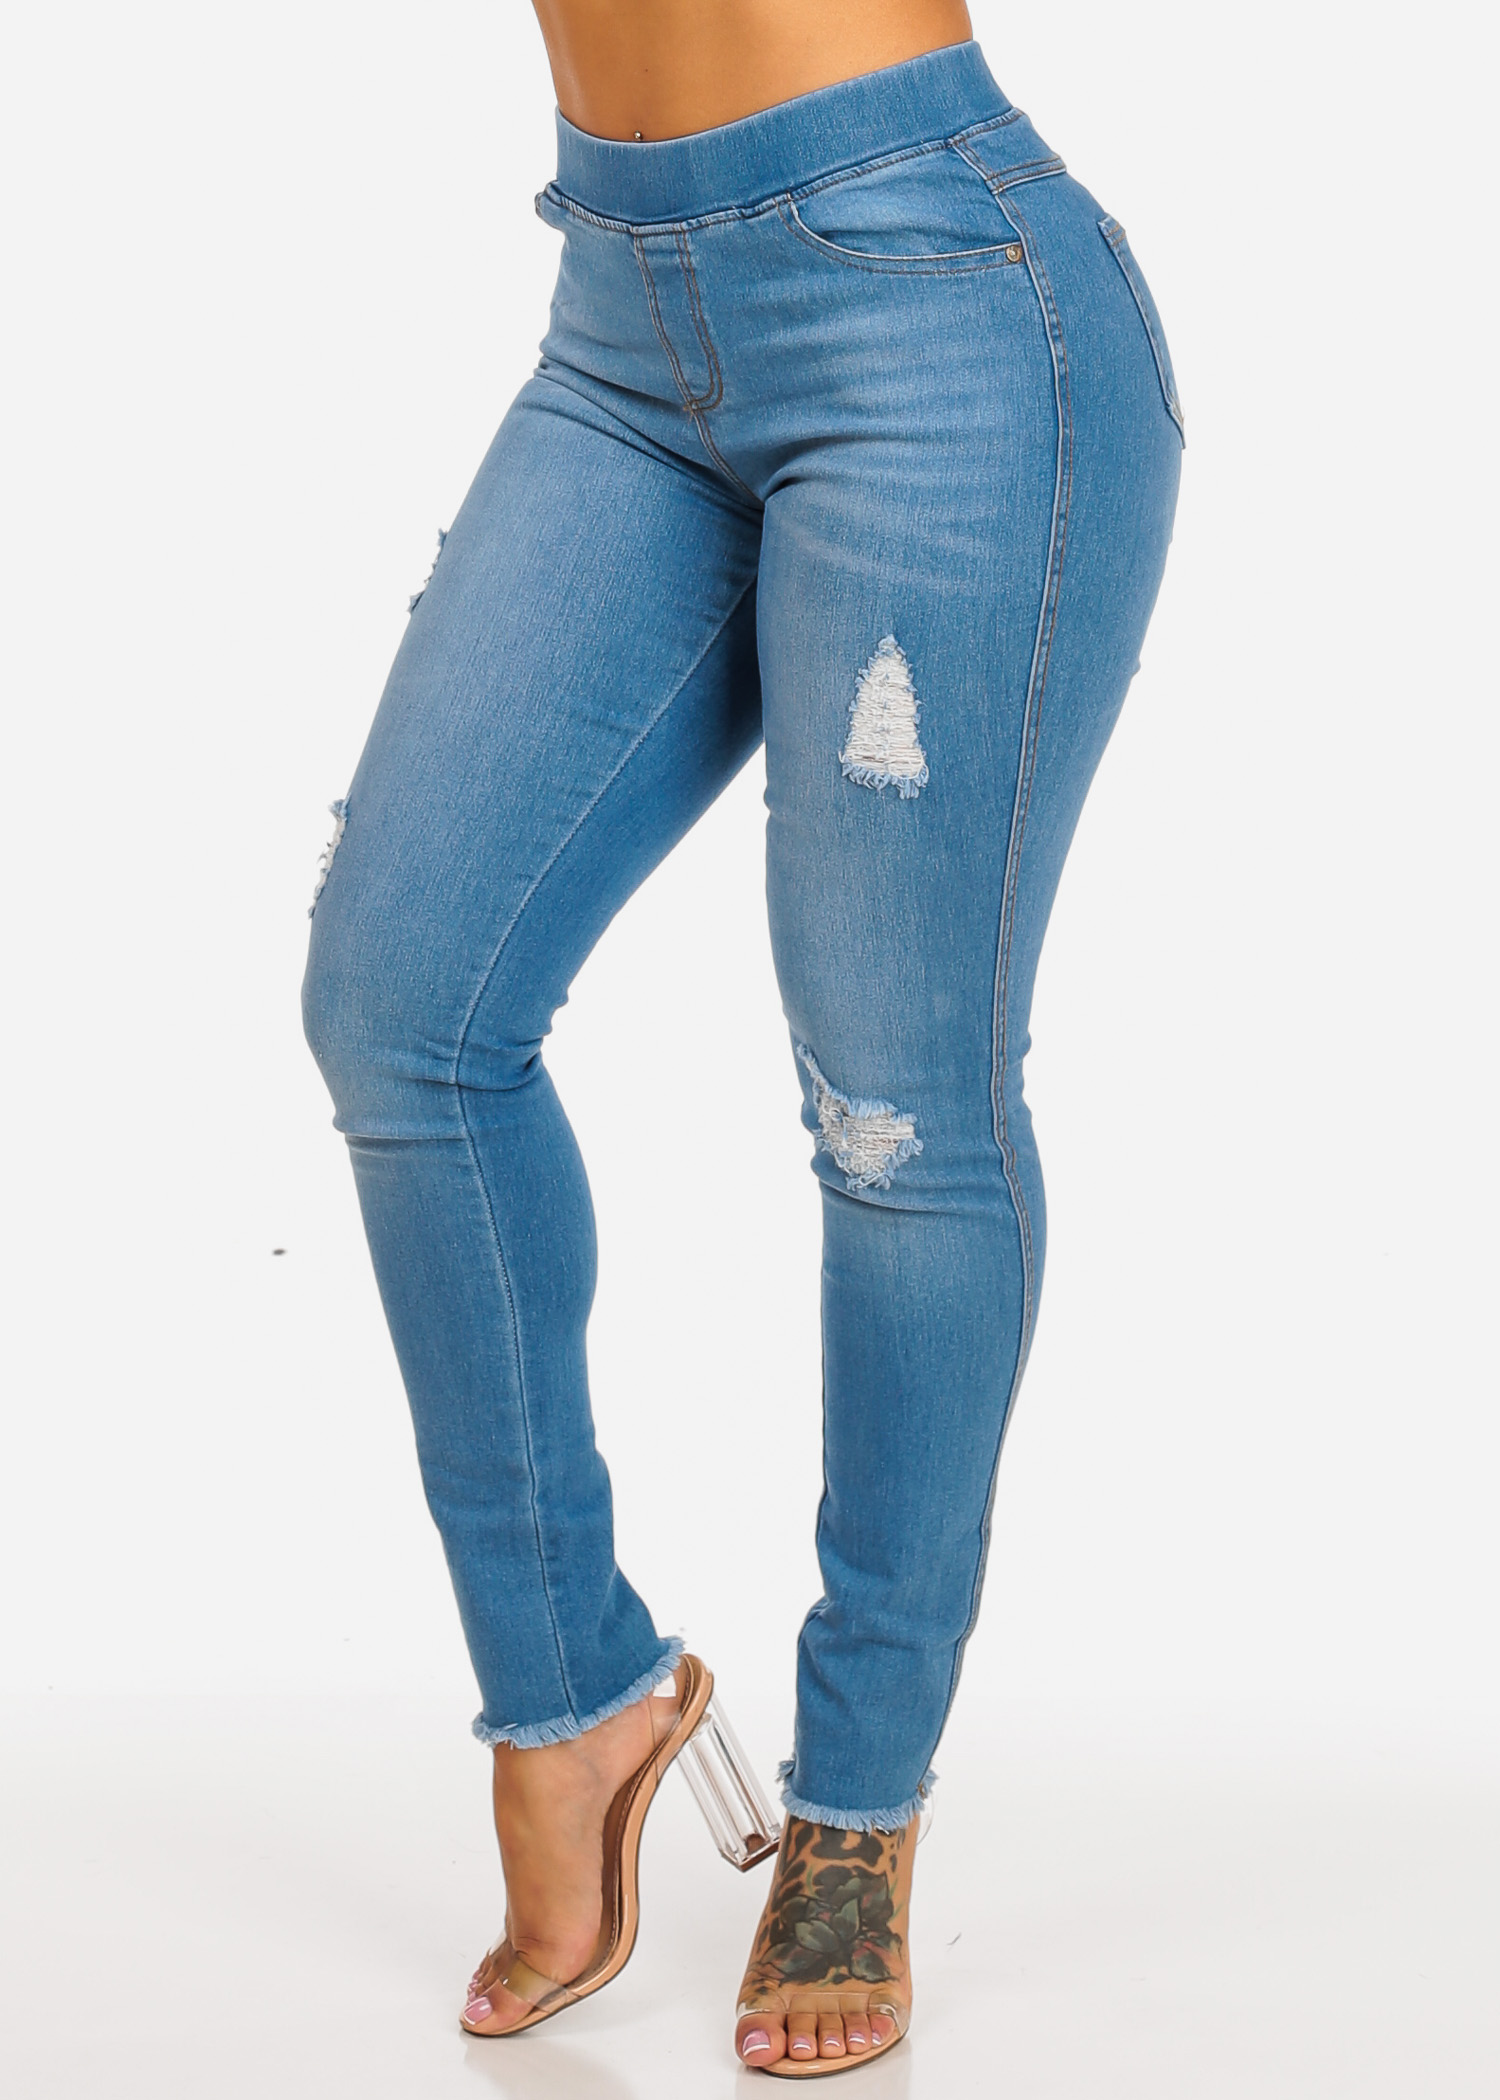 Womens Juniors Plus Size Light Blue High Waist Ripped Design Skinny Leg Raw Hem Casual Denim Jeans 10456M